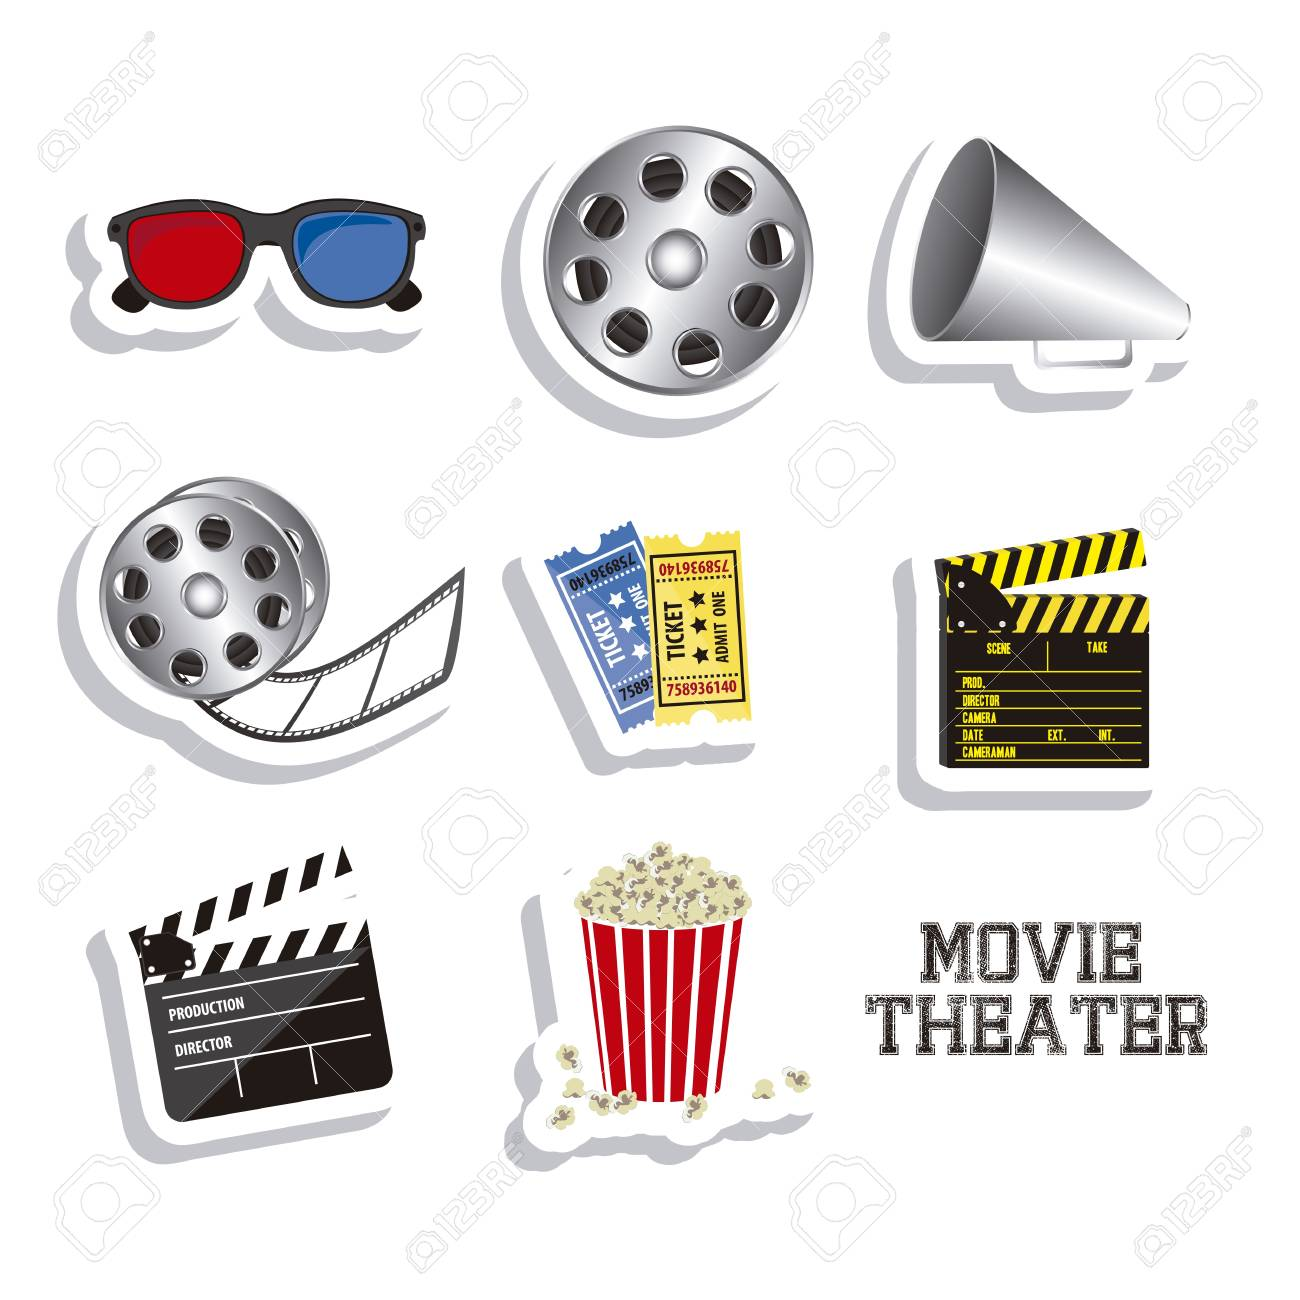 Illustration of icon of cinema, 3D cinema glasses,  director slate, popcorn, tickets, and Film reel, vector illustration Stock Vector - 18954291